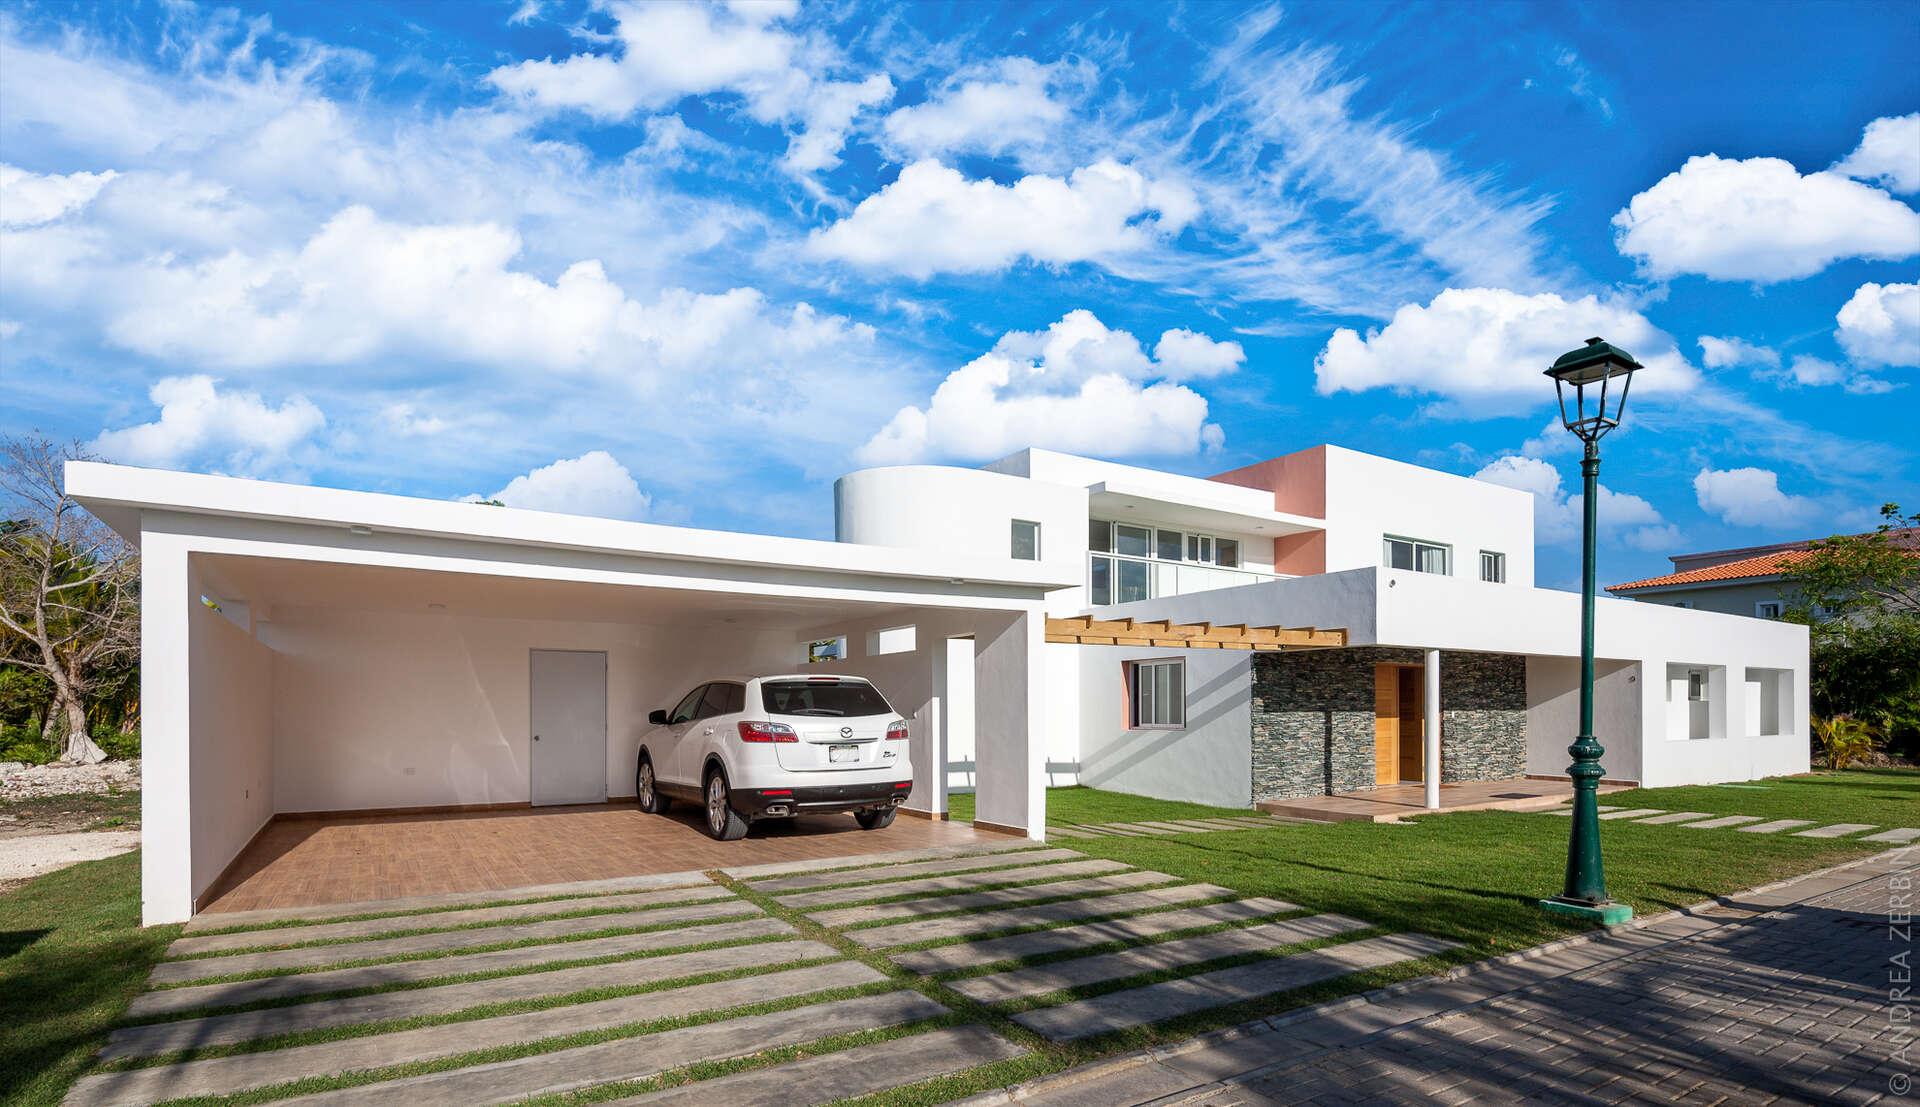 Luxury villa rentals caribbean - Dominican republic - Punta cana - Bavaro - Villa Moderna - Image 1/22